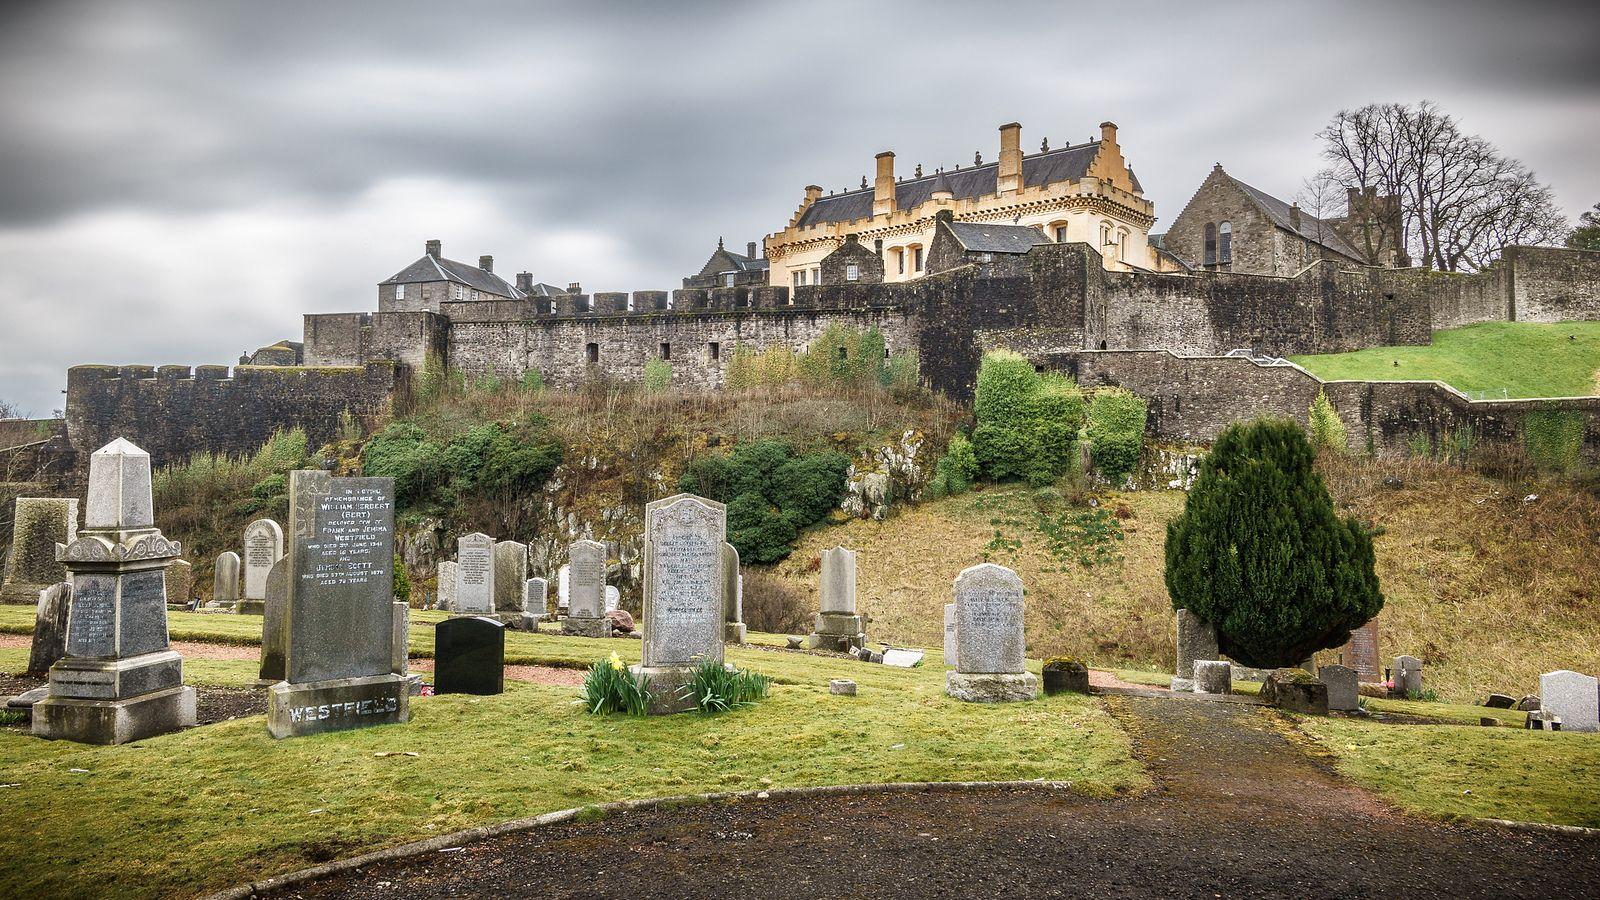 https://flic.kr/p/snb8rf | Stirling castle, Scotland, United Kingdom - Travel photography |